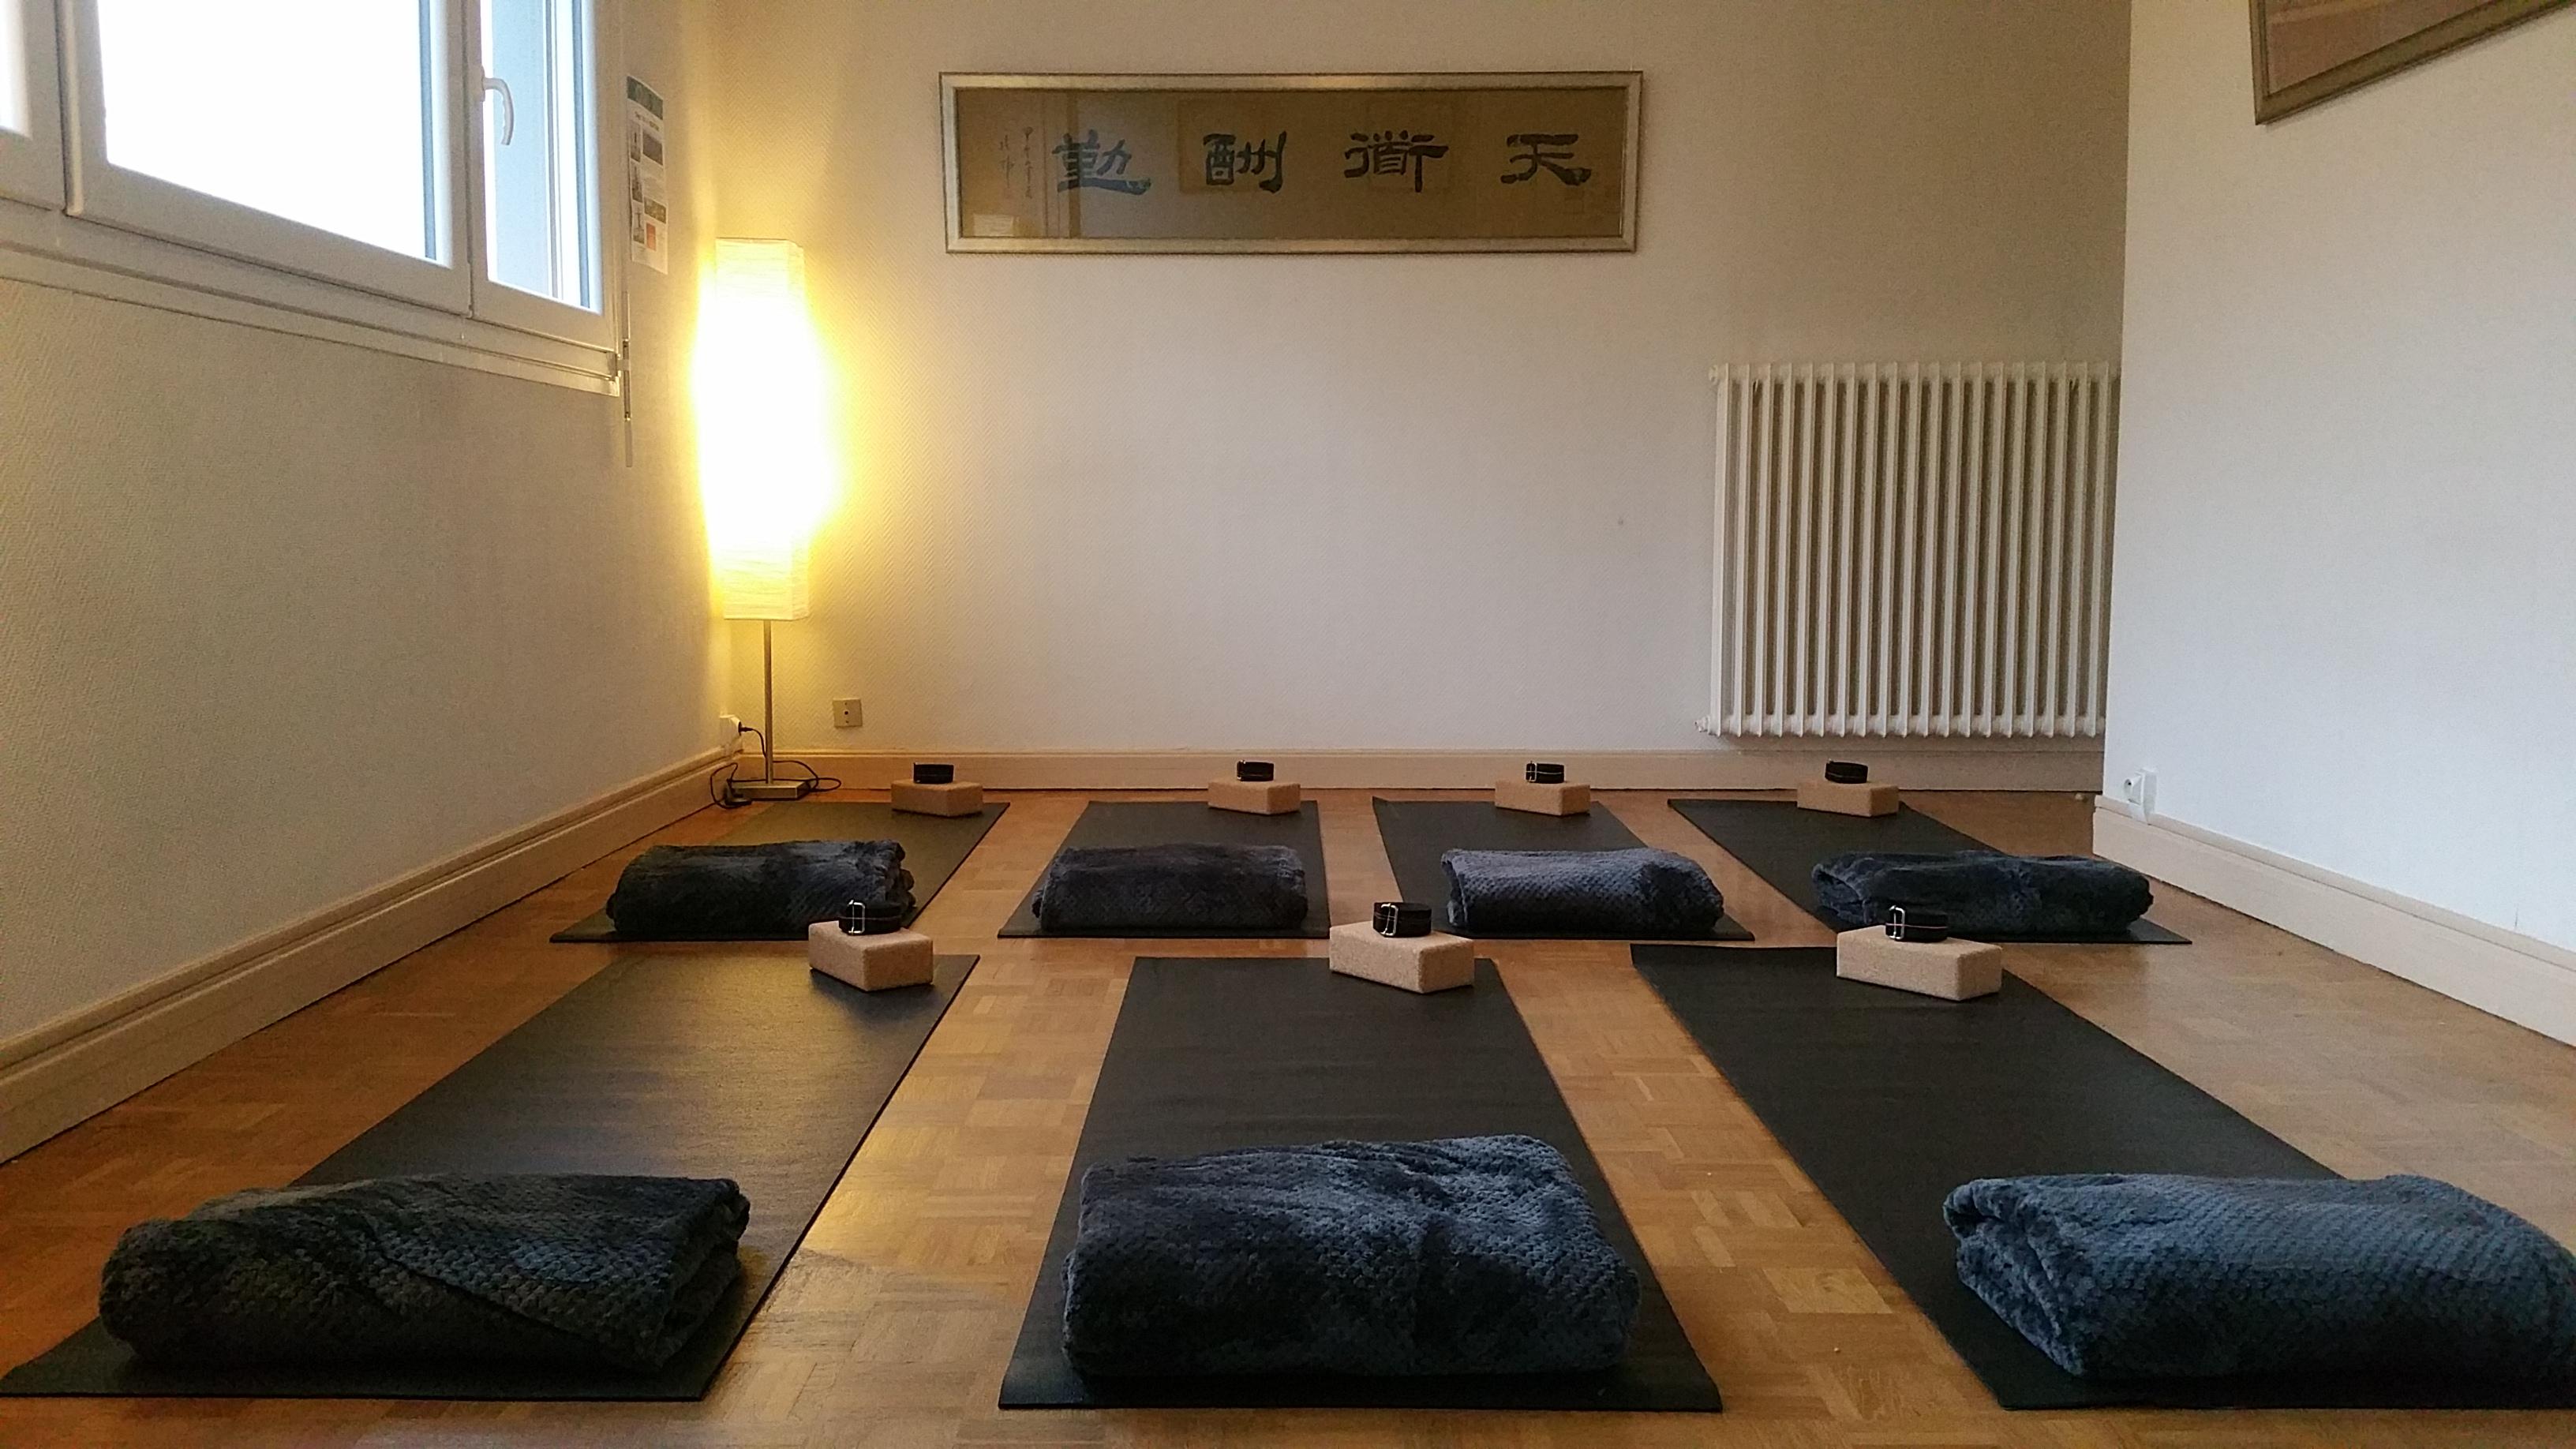 Institut bien-être massage ayurveda yoga Lorient; Groix; Morbihan; Bretagne Sud